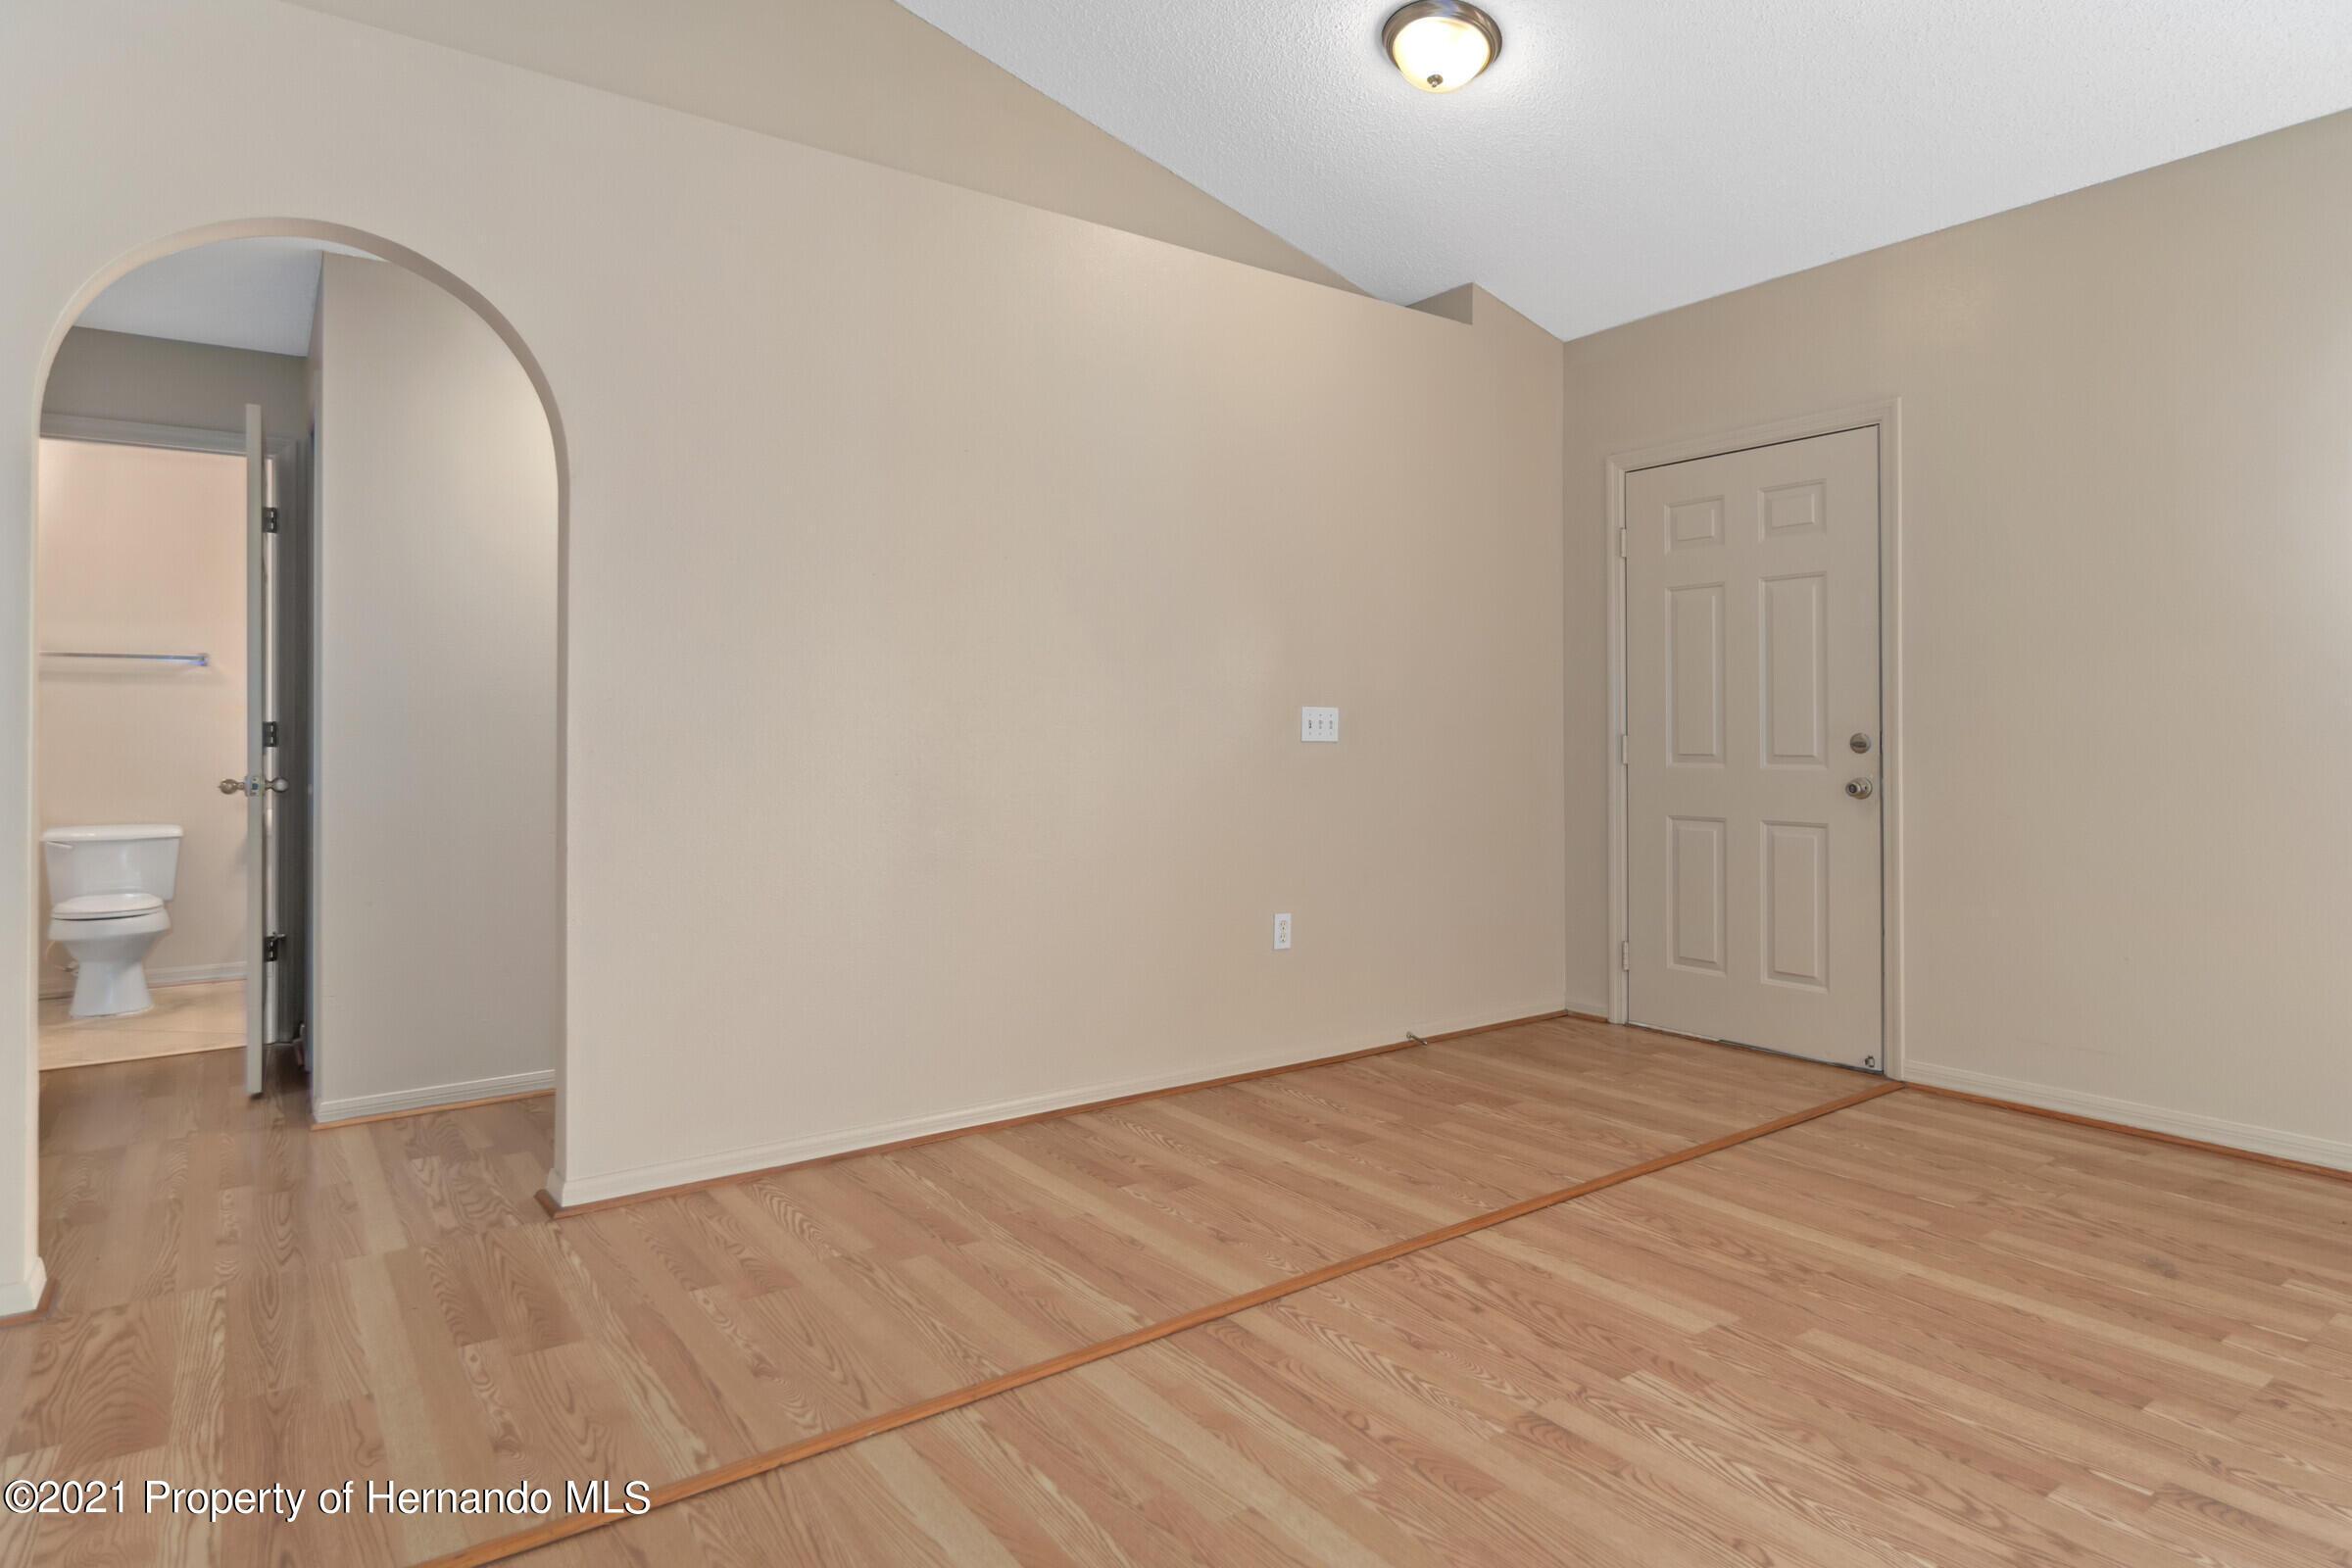 Image 5 For 5155 Baldock Avenue